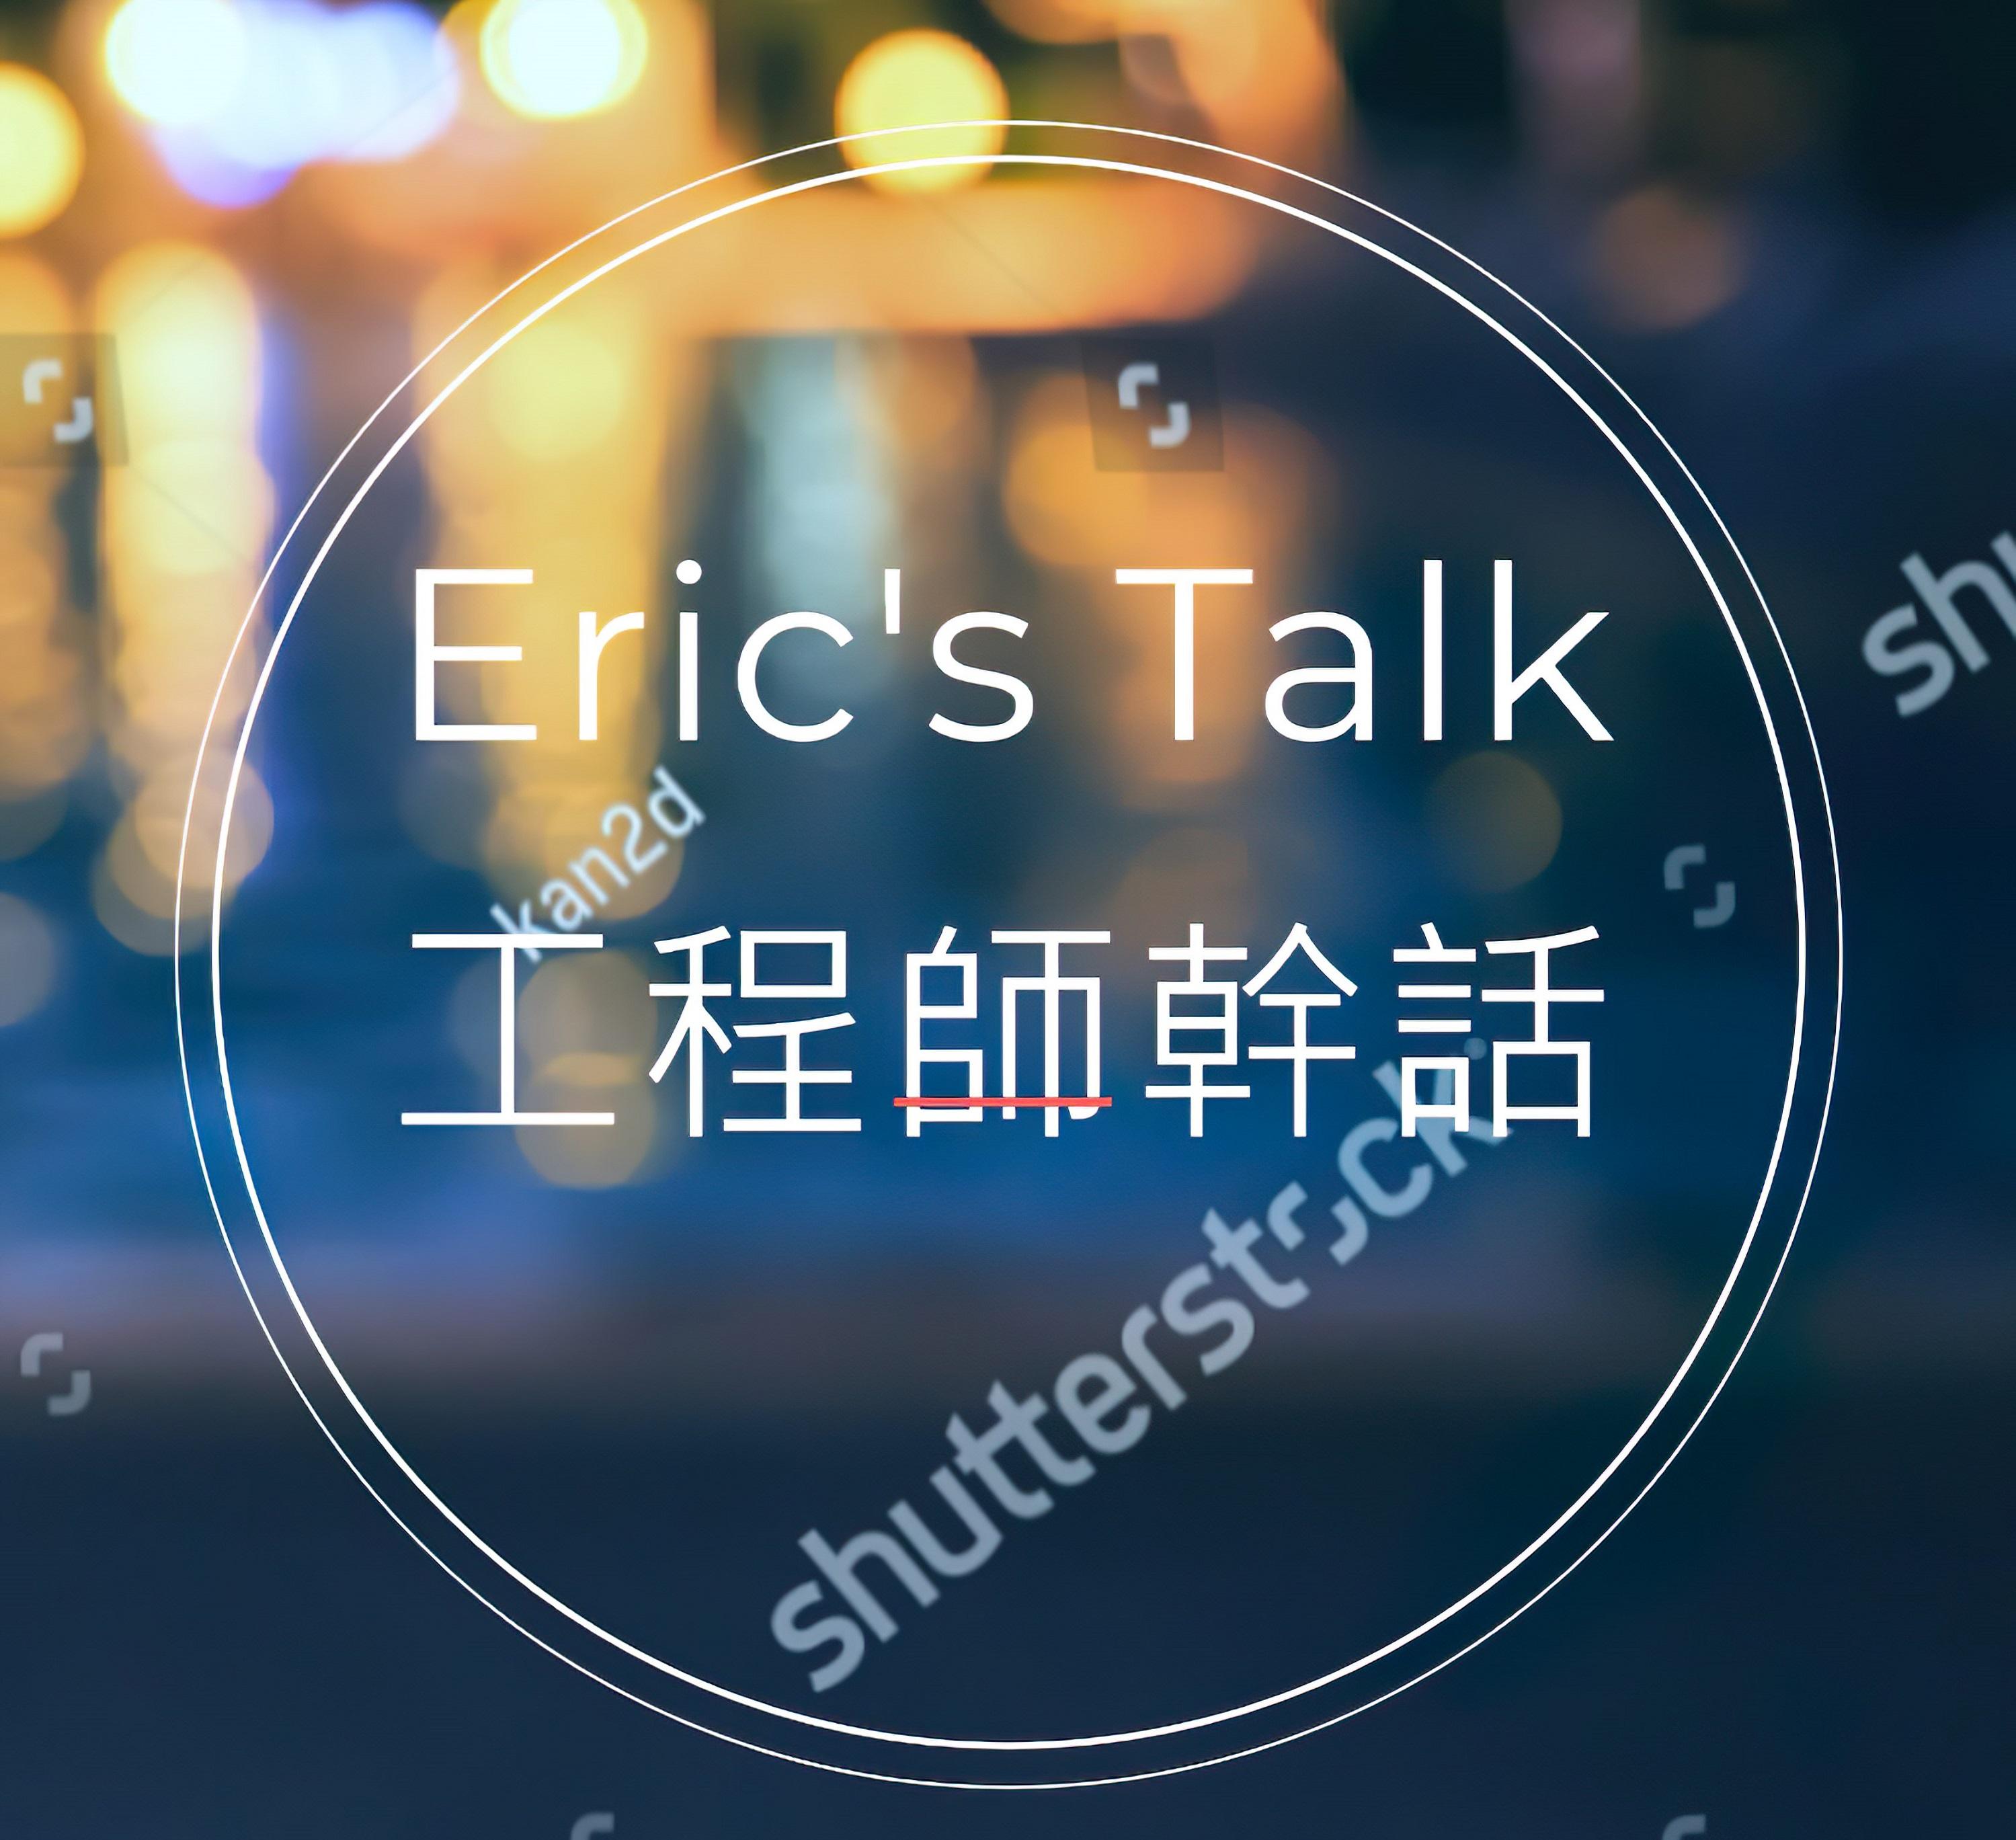 [Eric's Talk EP1]誰的青春不迷惘  工作兩年的心得